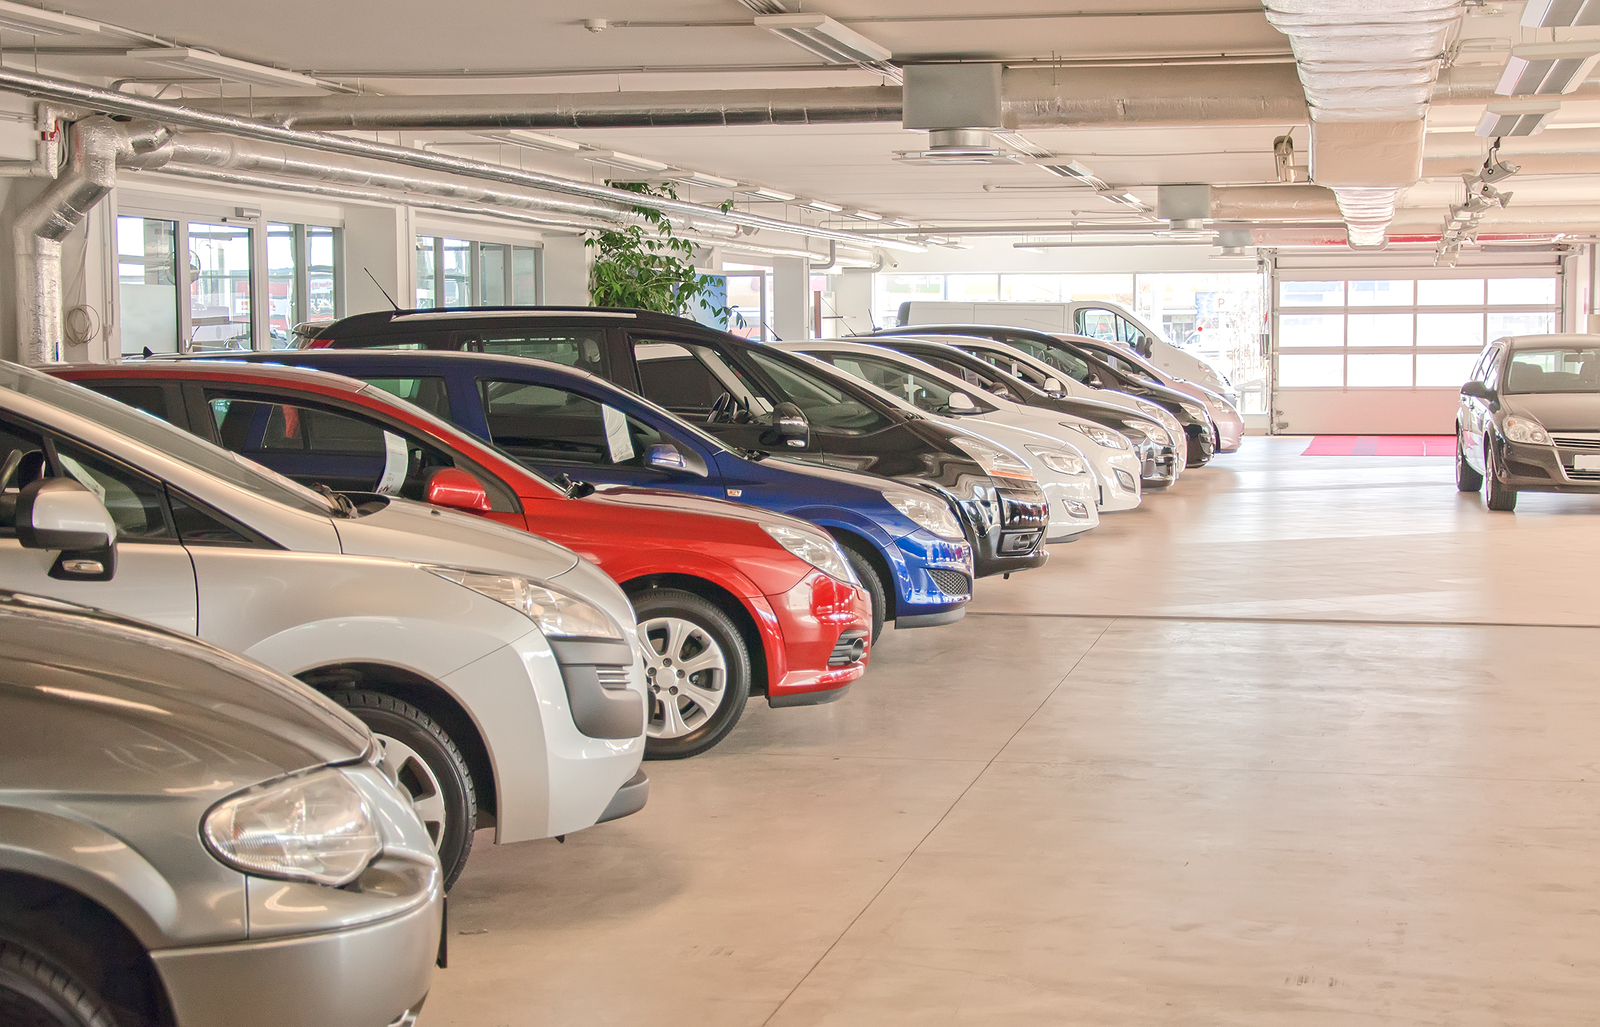 How to get an nj dealer license and bond for Motor vehicle surety bond